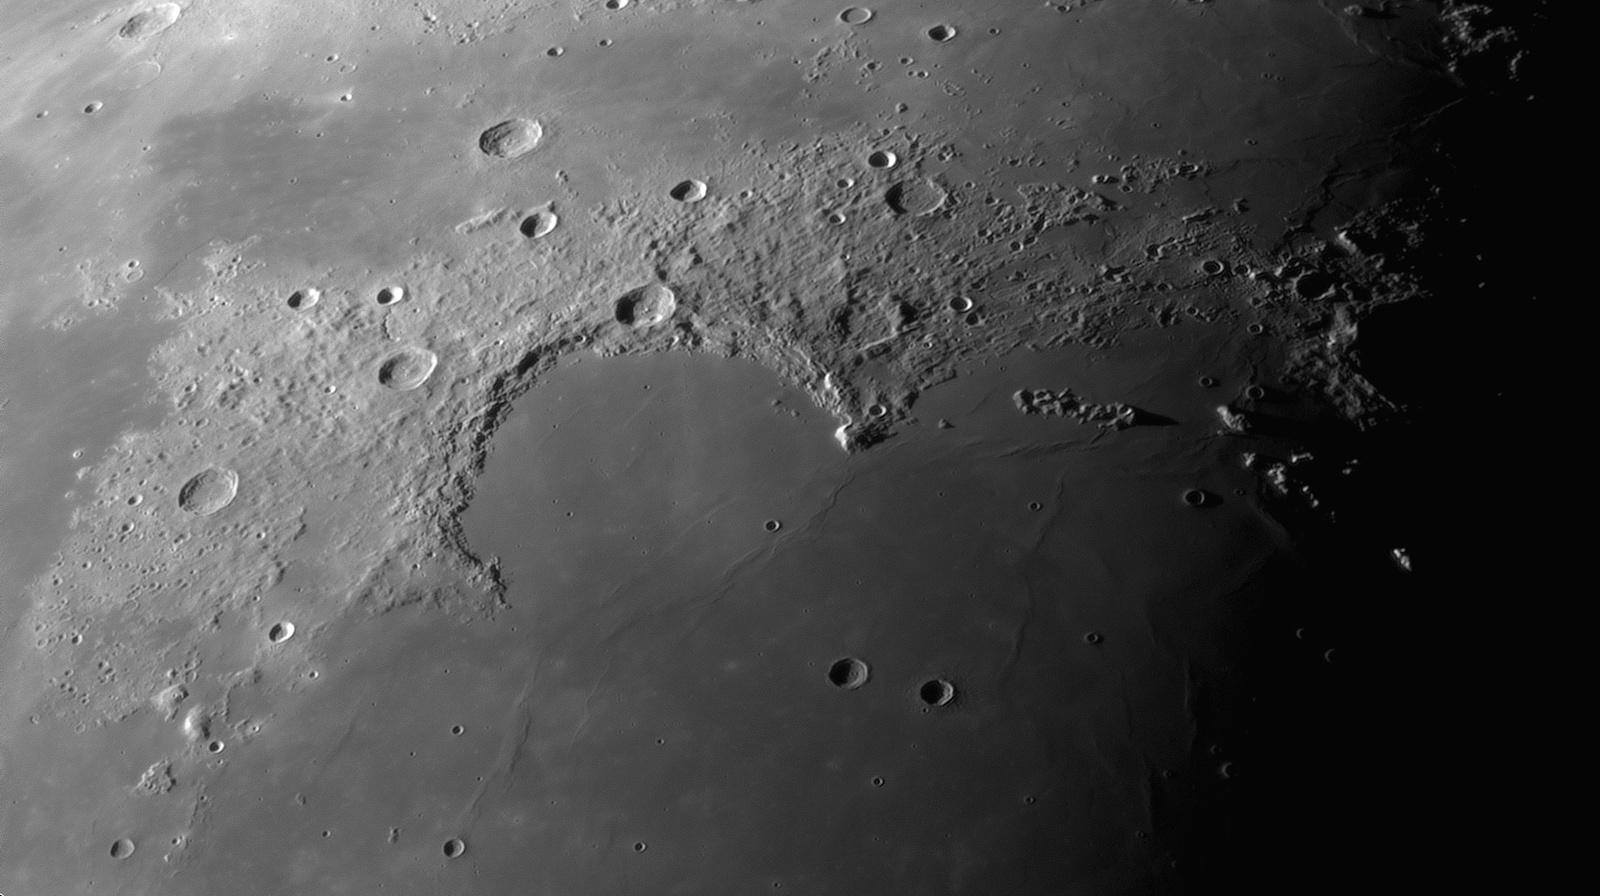 Sinus Iridum, Montes Jura, Gruithuisen domes_24.08.2019r_03.47_TS152F2270_ASI290MM_Halpha 35nm_105%....jpg